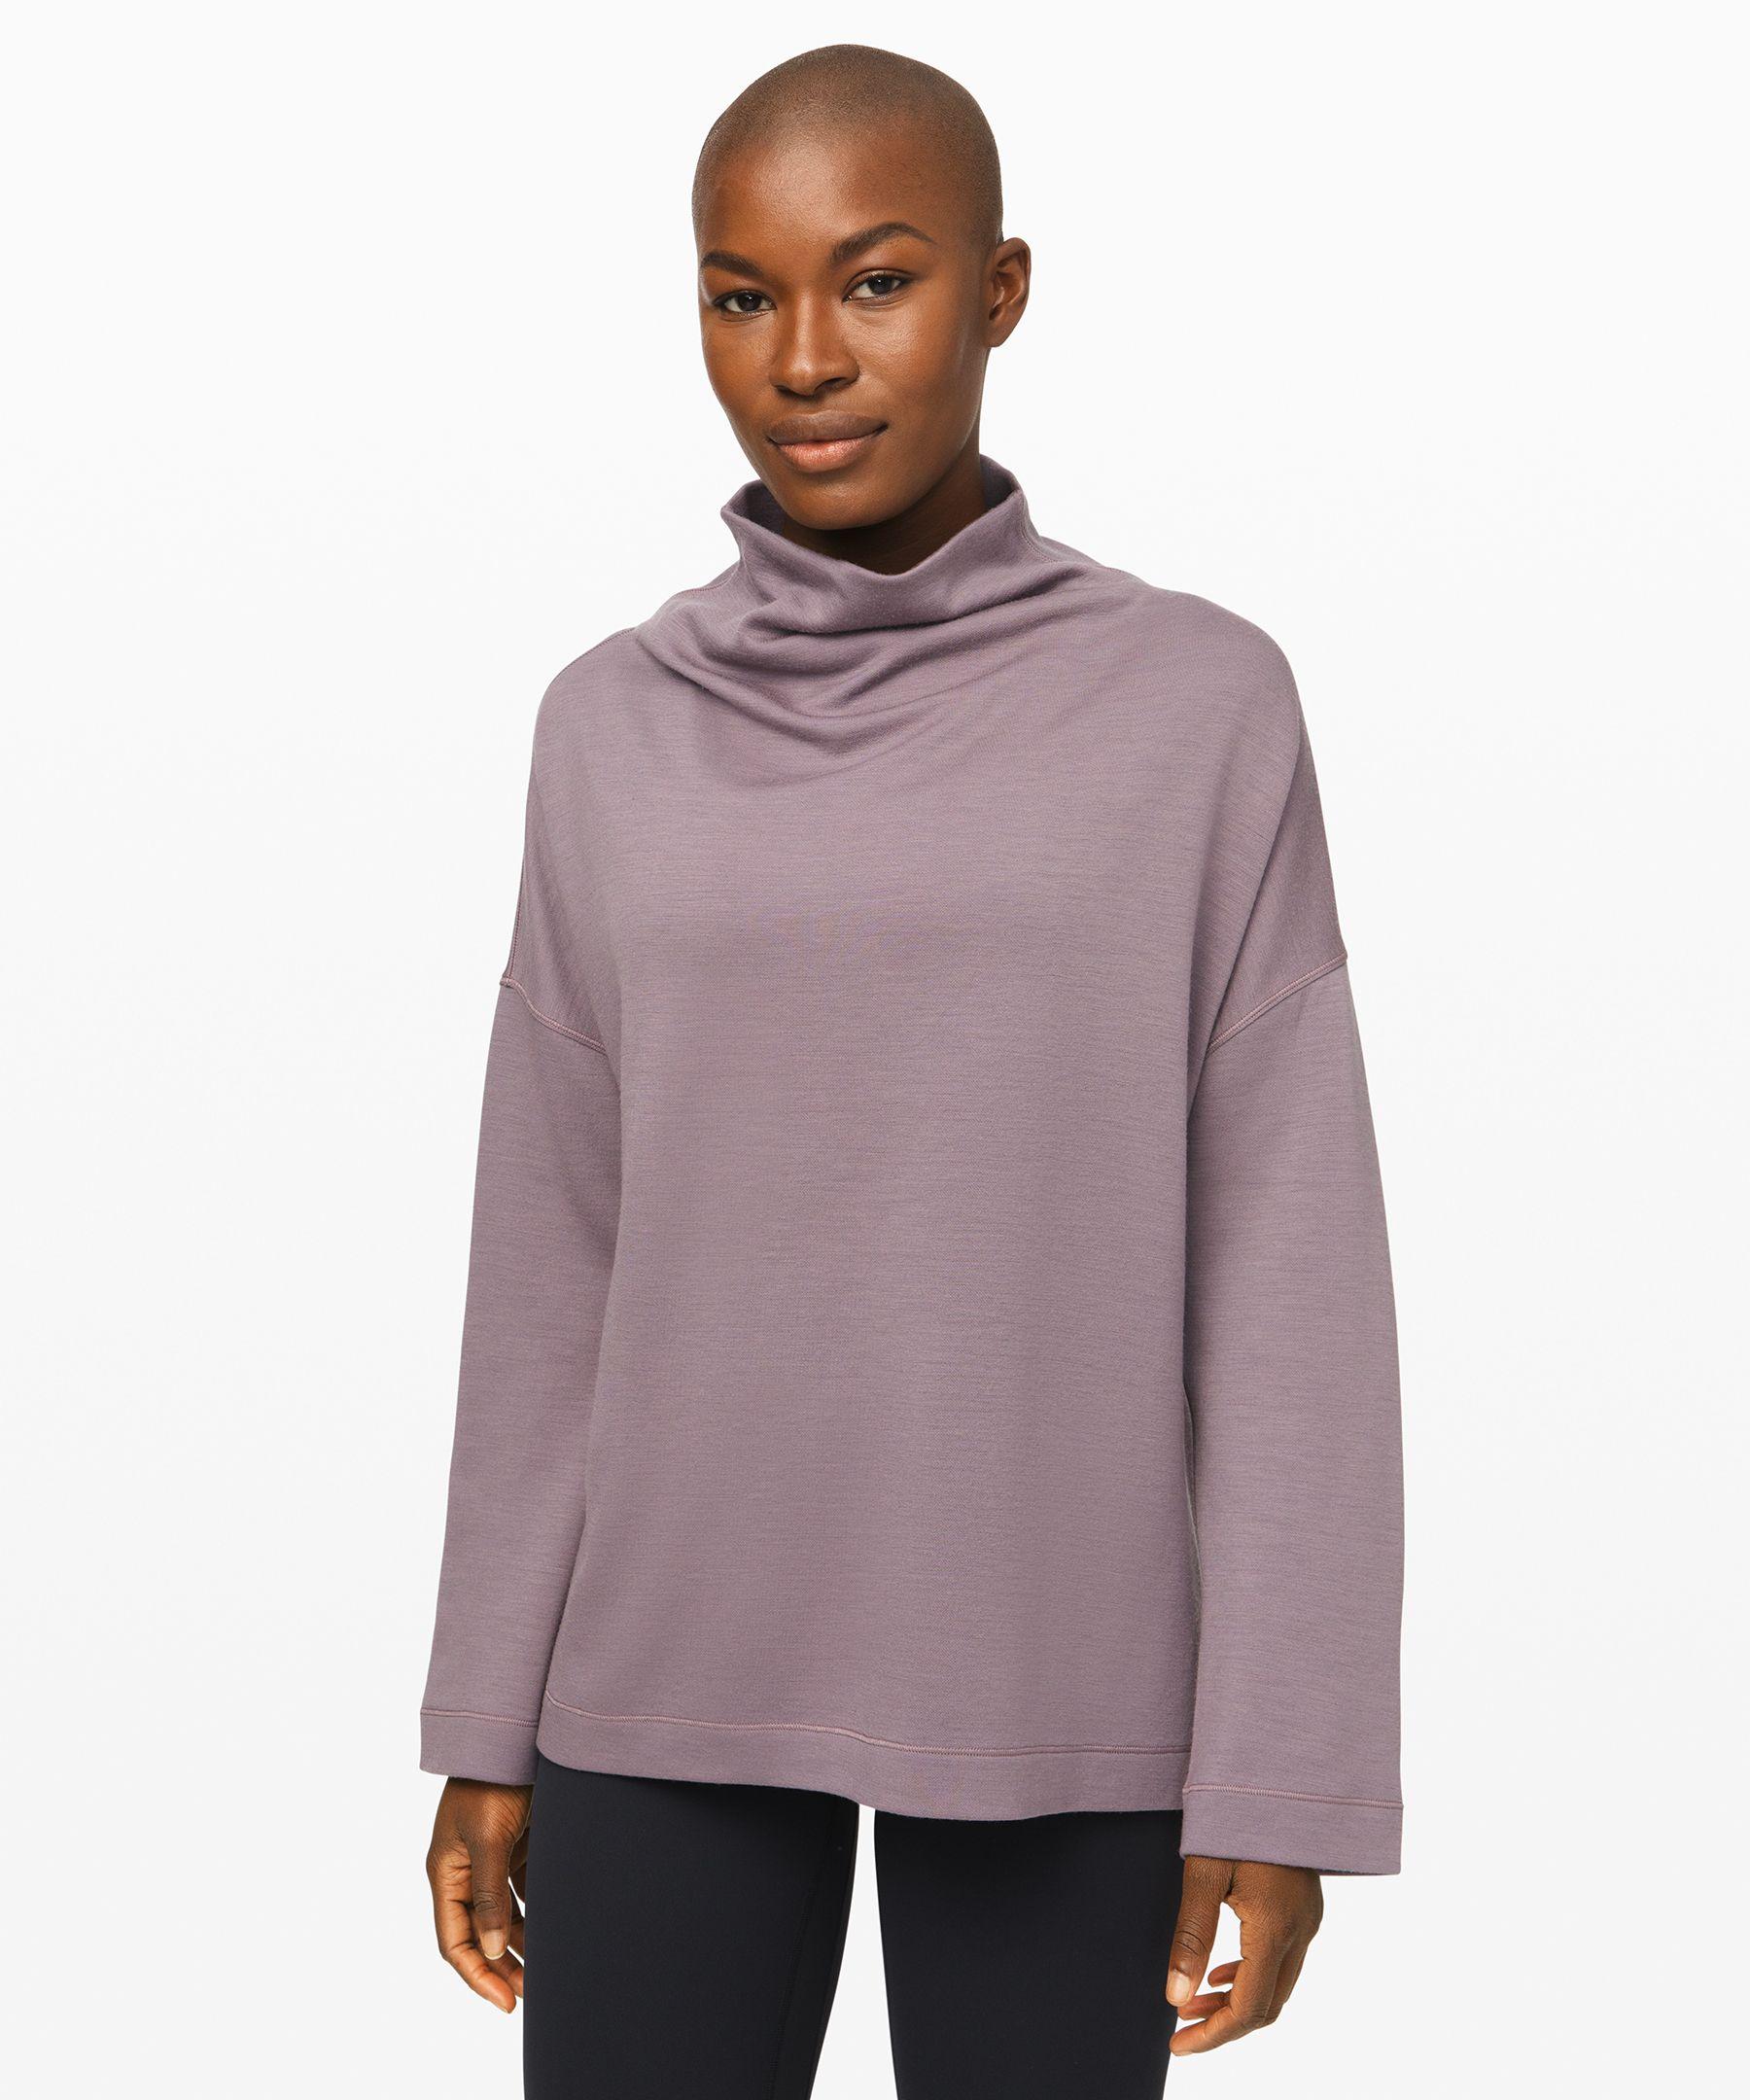 Principal Dancer Funnel Neck Sweater New by Lululemon